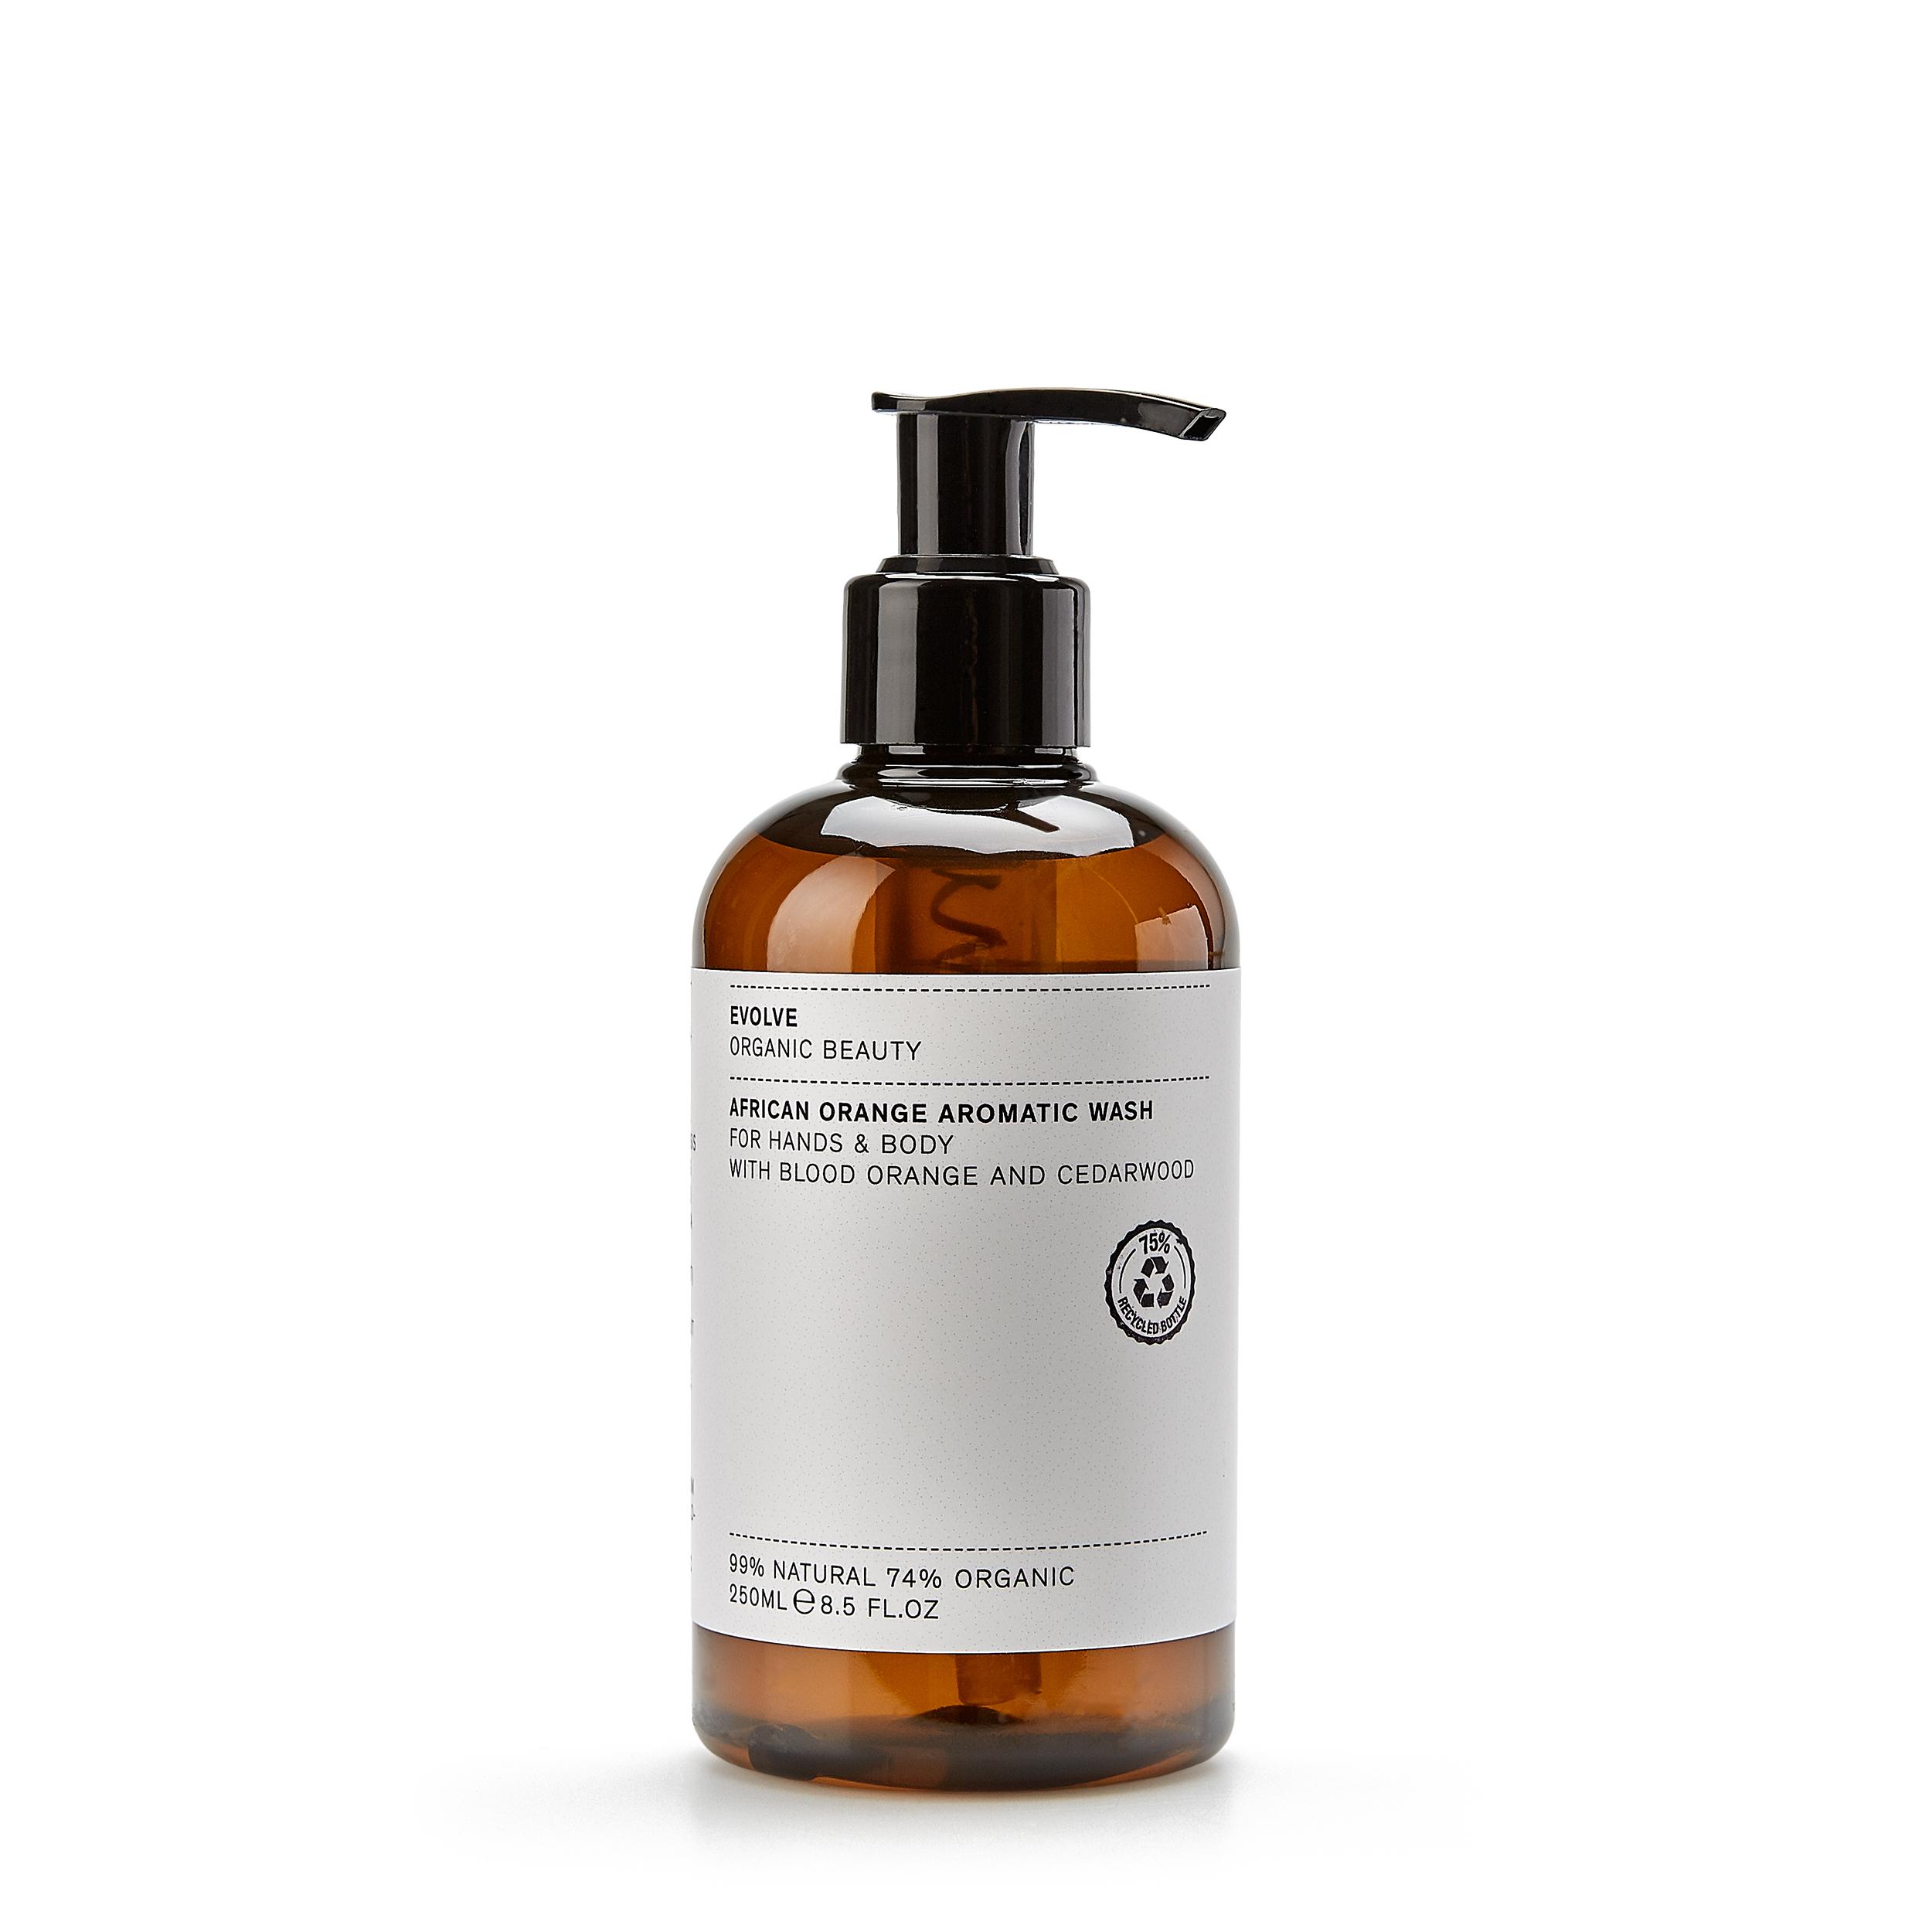 Evolve Organic Beauty Очищающий гель для рук и тела «African Orange Aromatic Wash» 250 мл фото